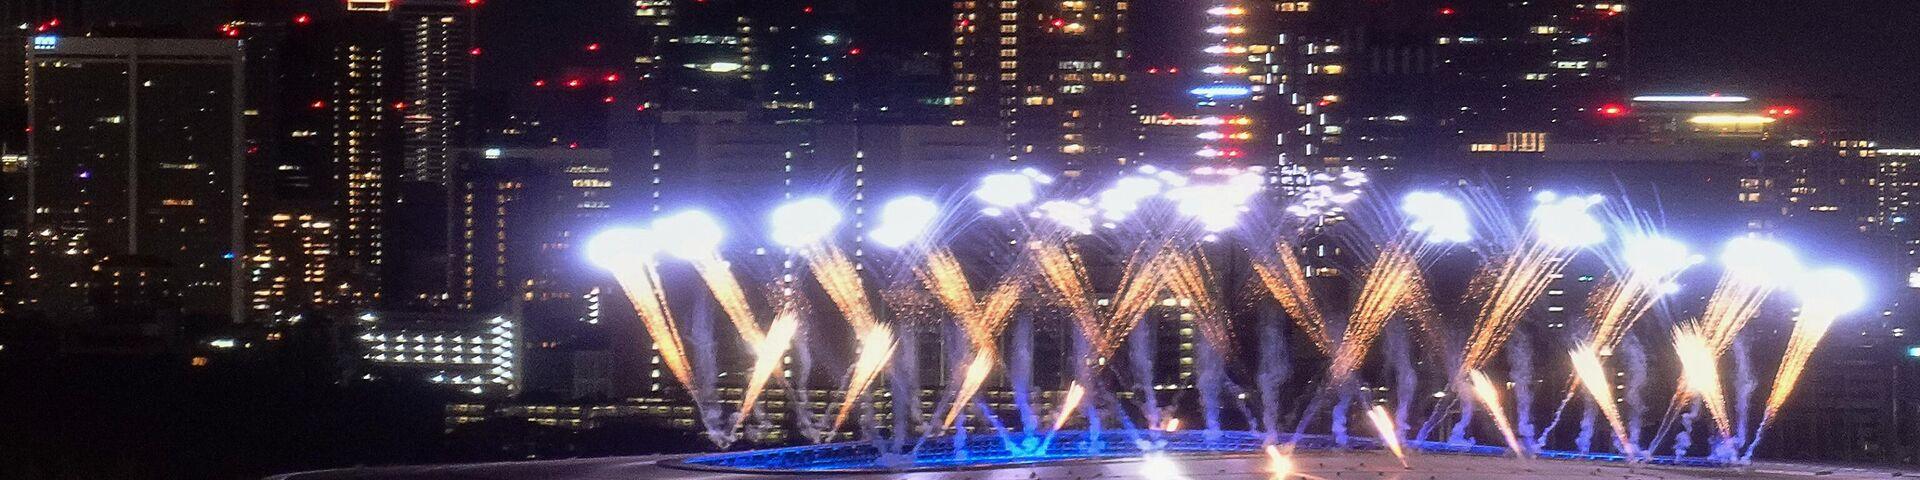 Салют на олимпийском стадионе в Токио - РИА Новости, 1920, 16.08.2021